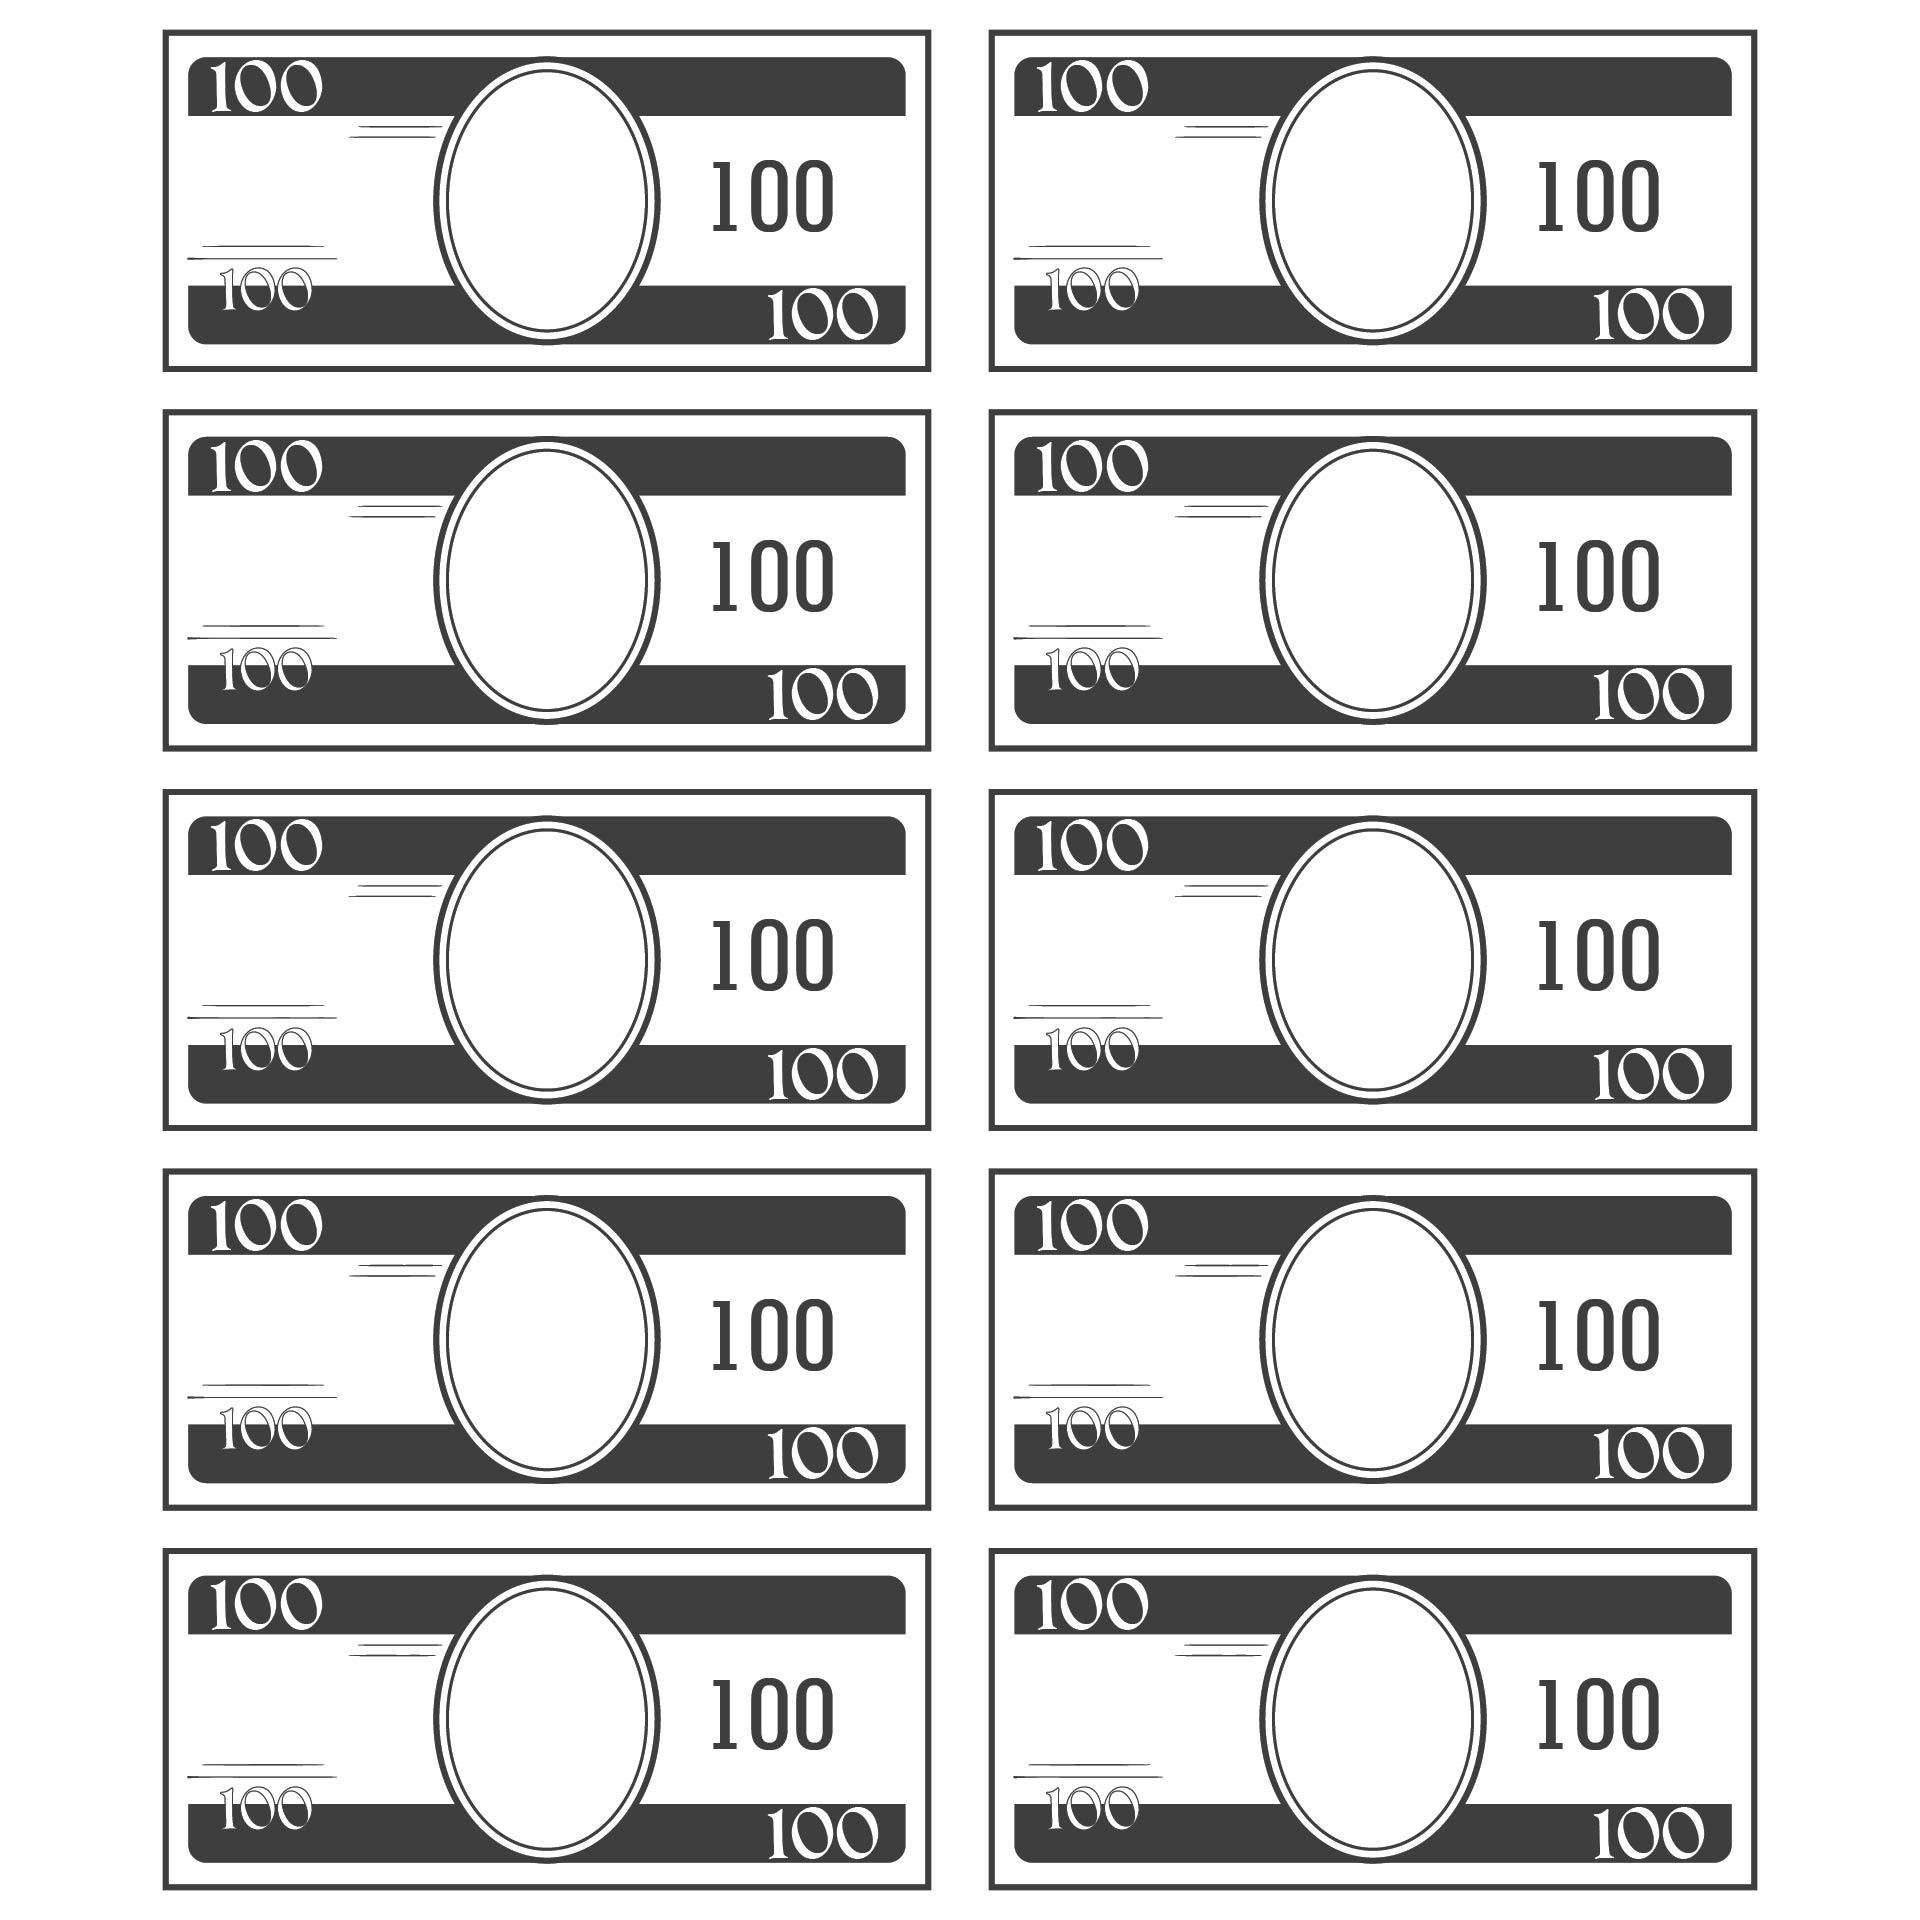 Printable Play Money Actual Size